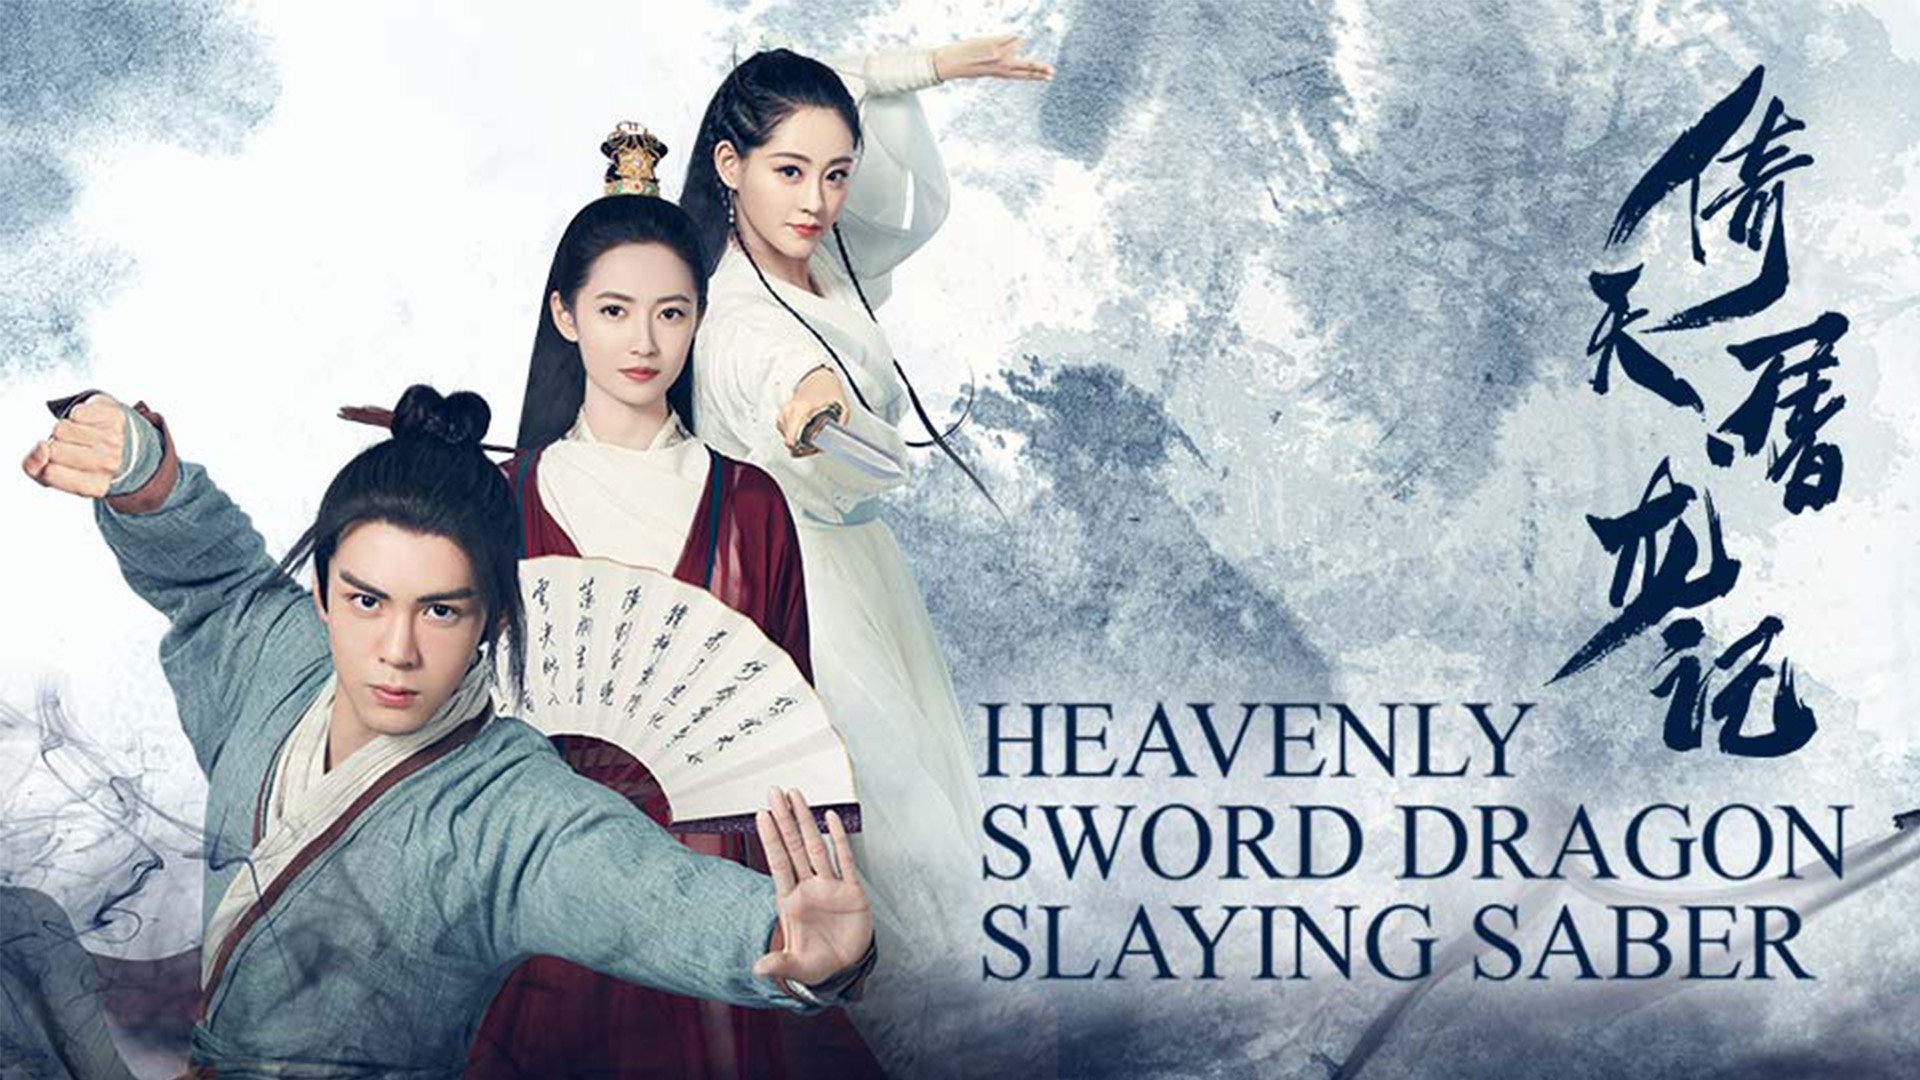 Heavenly Sword and Dragon Slaying Sabre